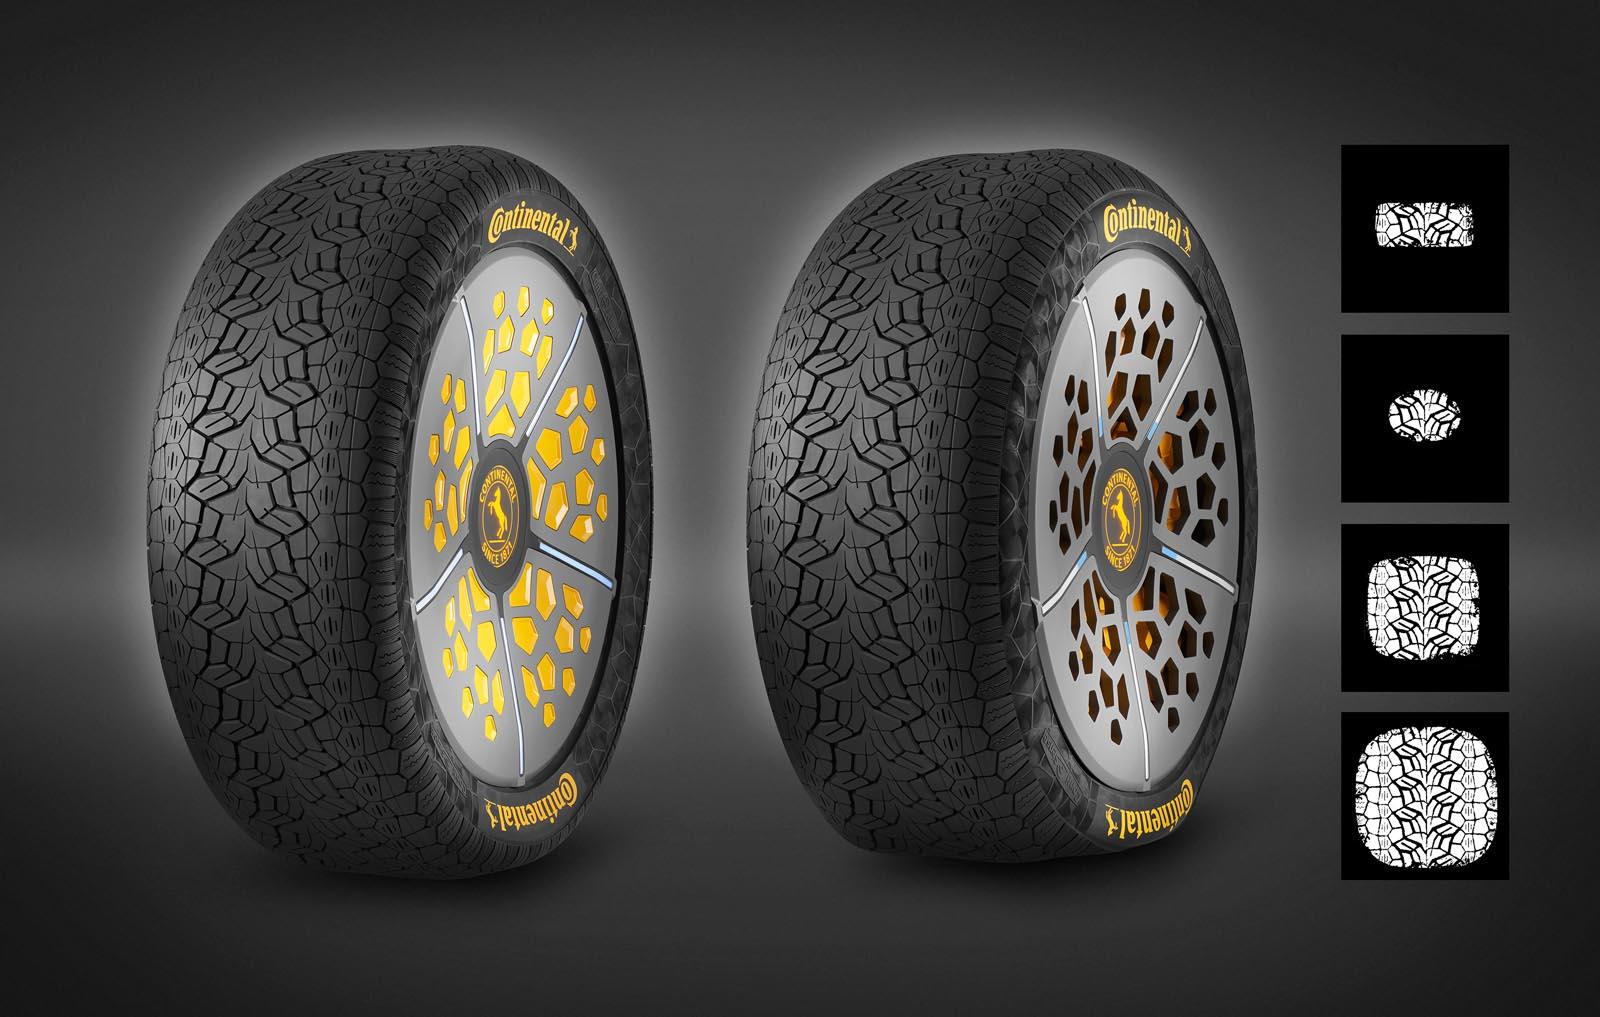 Photo of Η Continental παρουσιάζει 2 νέα concepts τεχνολογίας ελαστικών